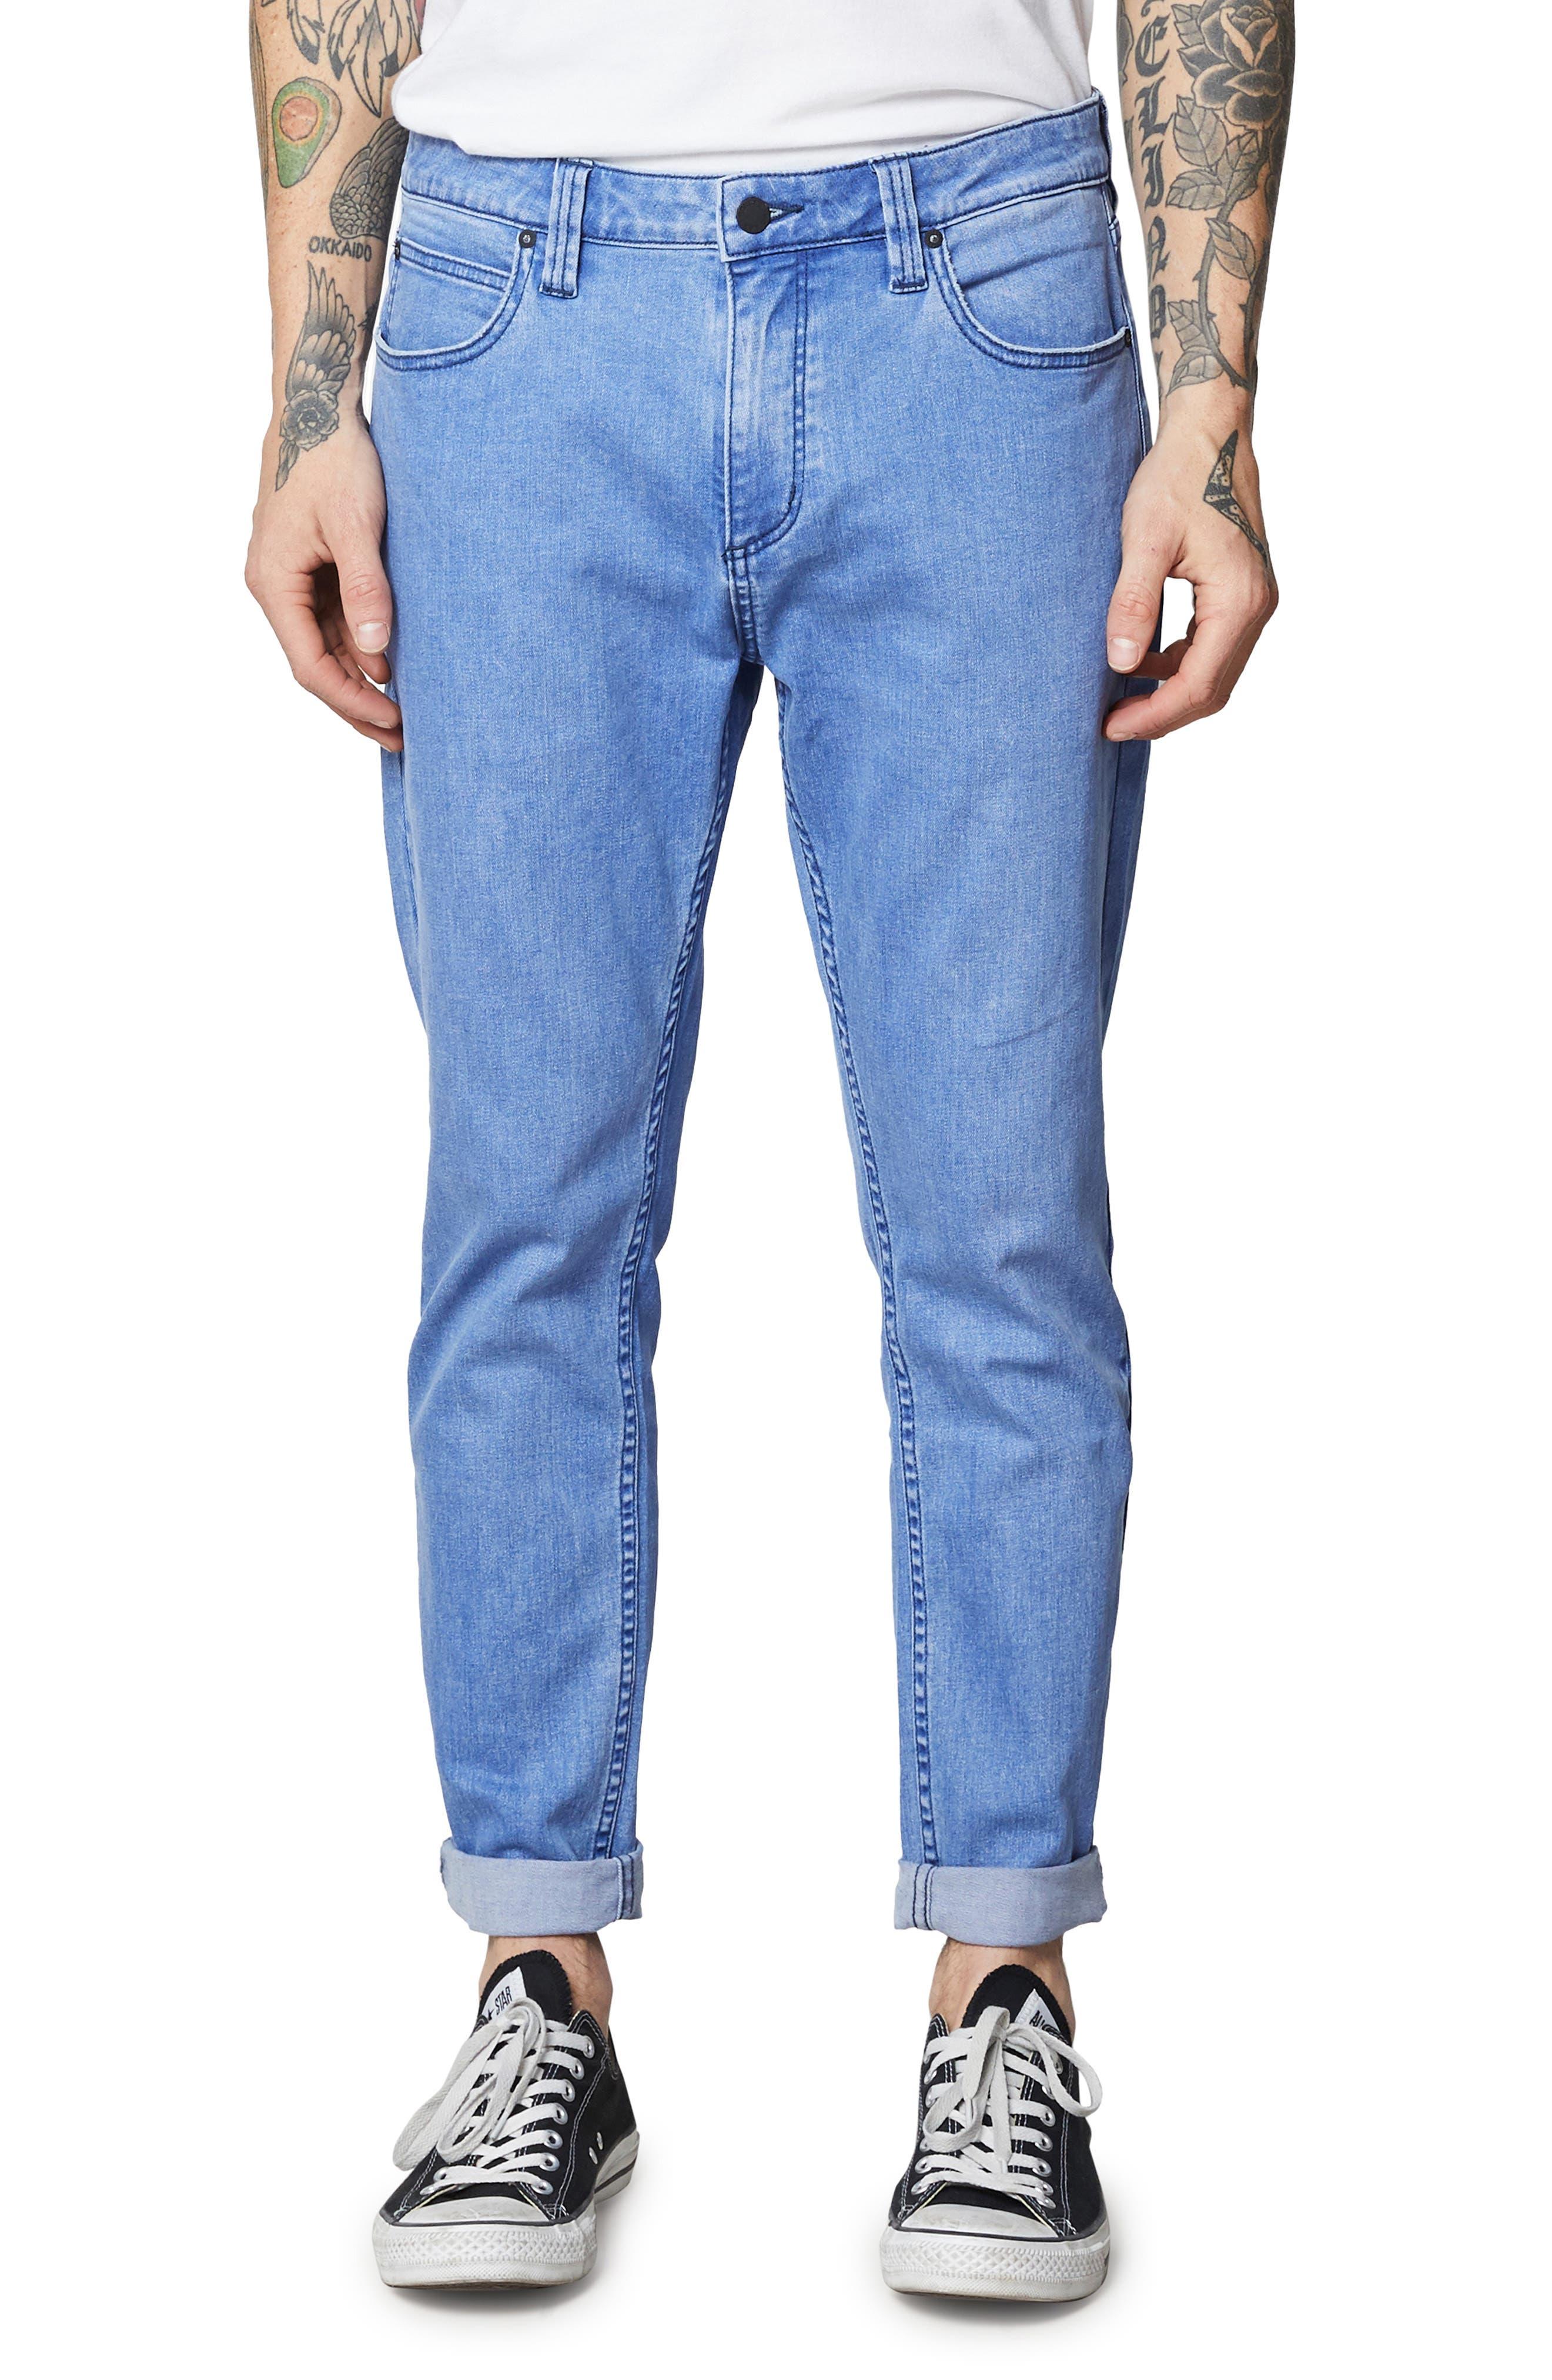 Rollies Slim Fit Jeans,                             Main thumbnail 1, color,                             BOLD BLUE